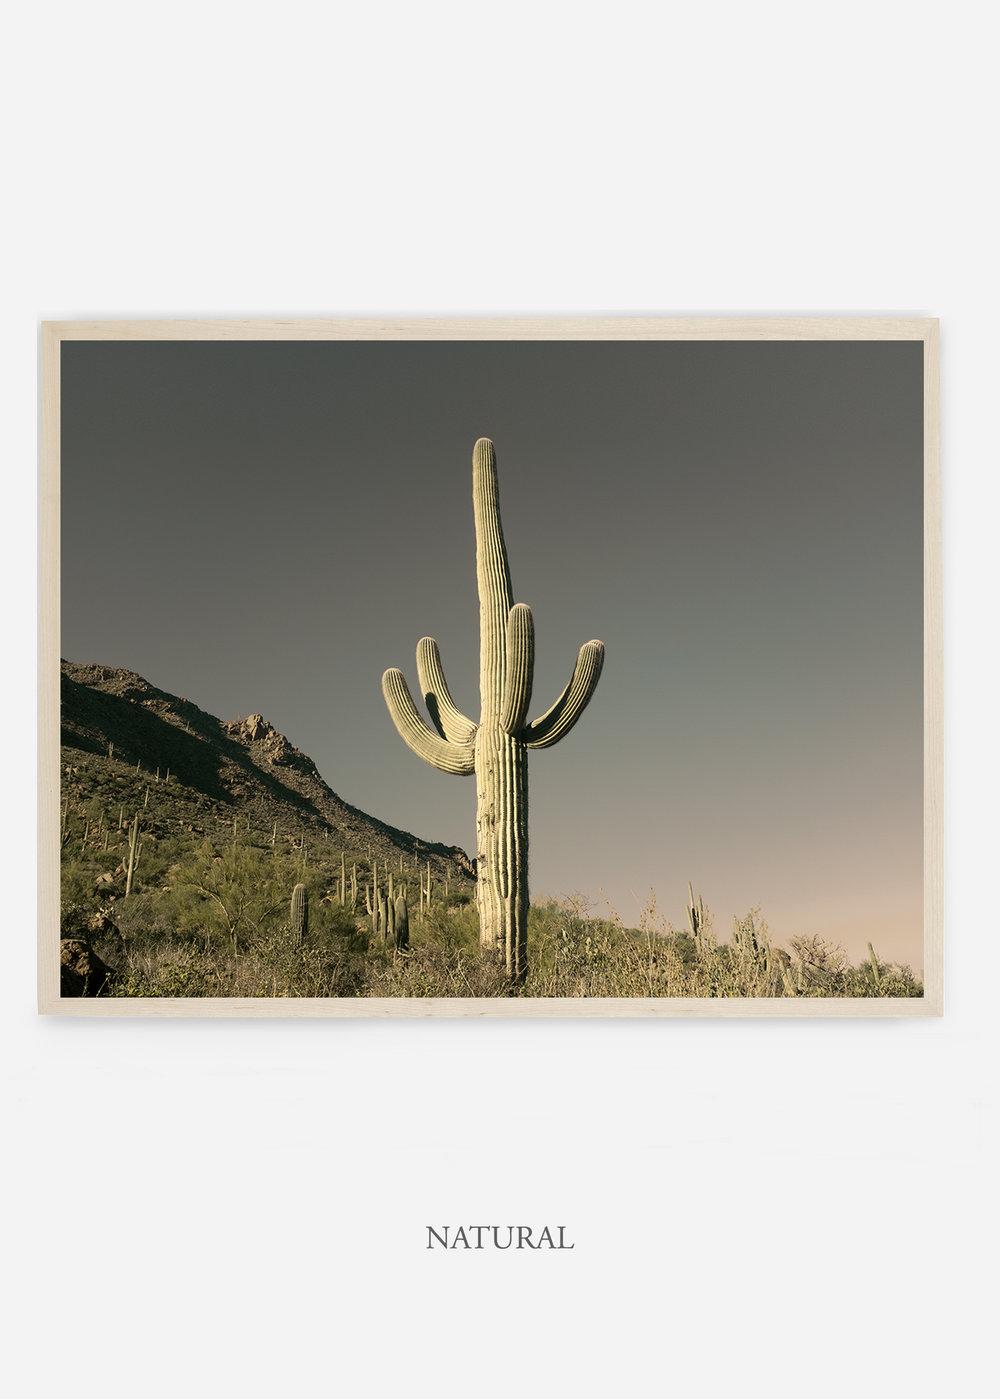 nomat_naturalframe-saguaroNo.19-wildercalifornia-art-wallart-cactusprint-homedecor-prints-arizona-botanical-artwork-interiordesign.jpg